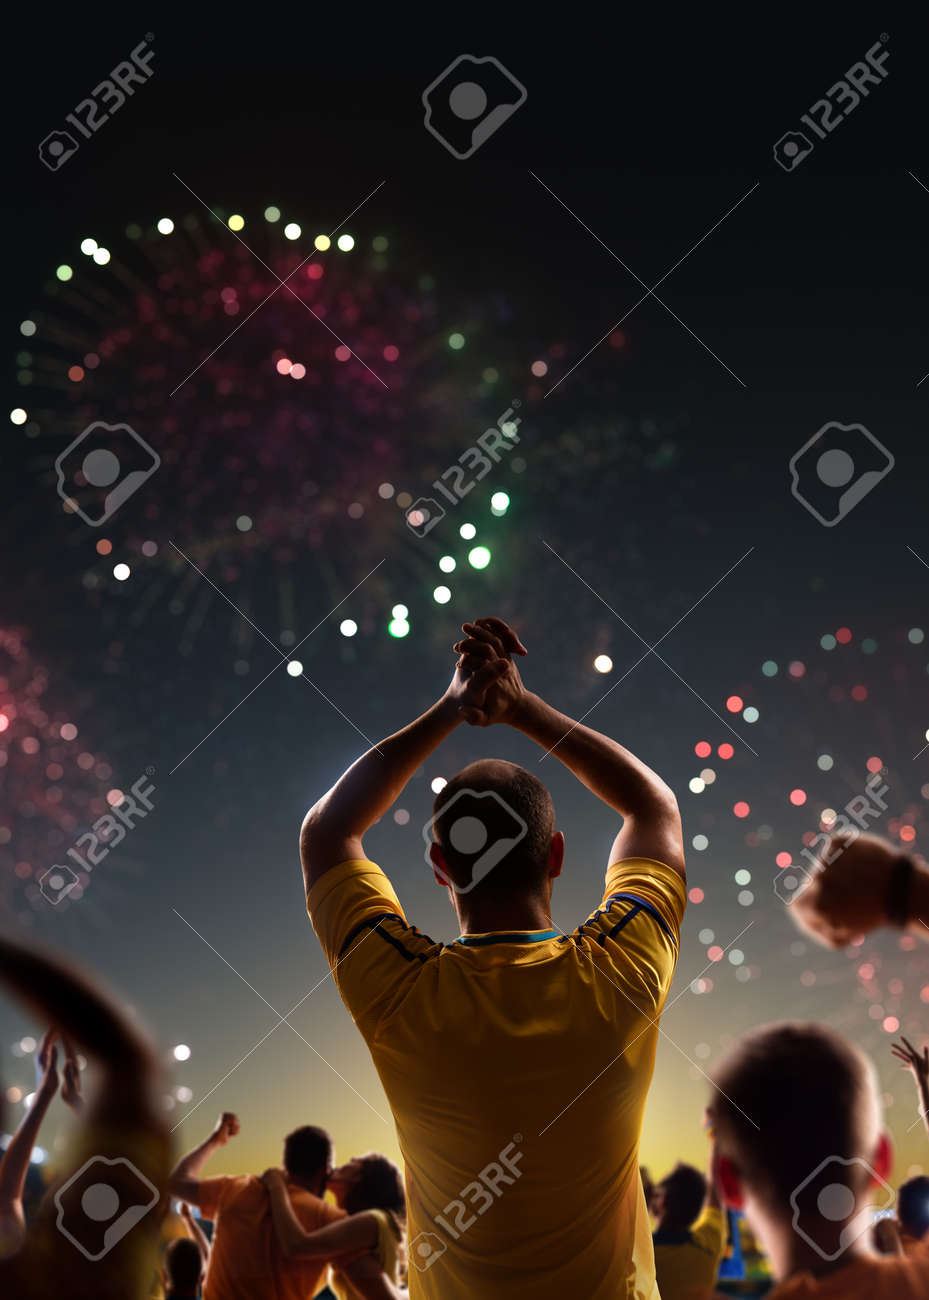 Fans celebrate in Stadium Arena night fireworks - 157252578